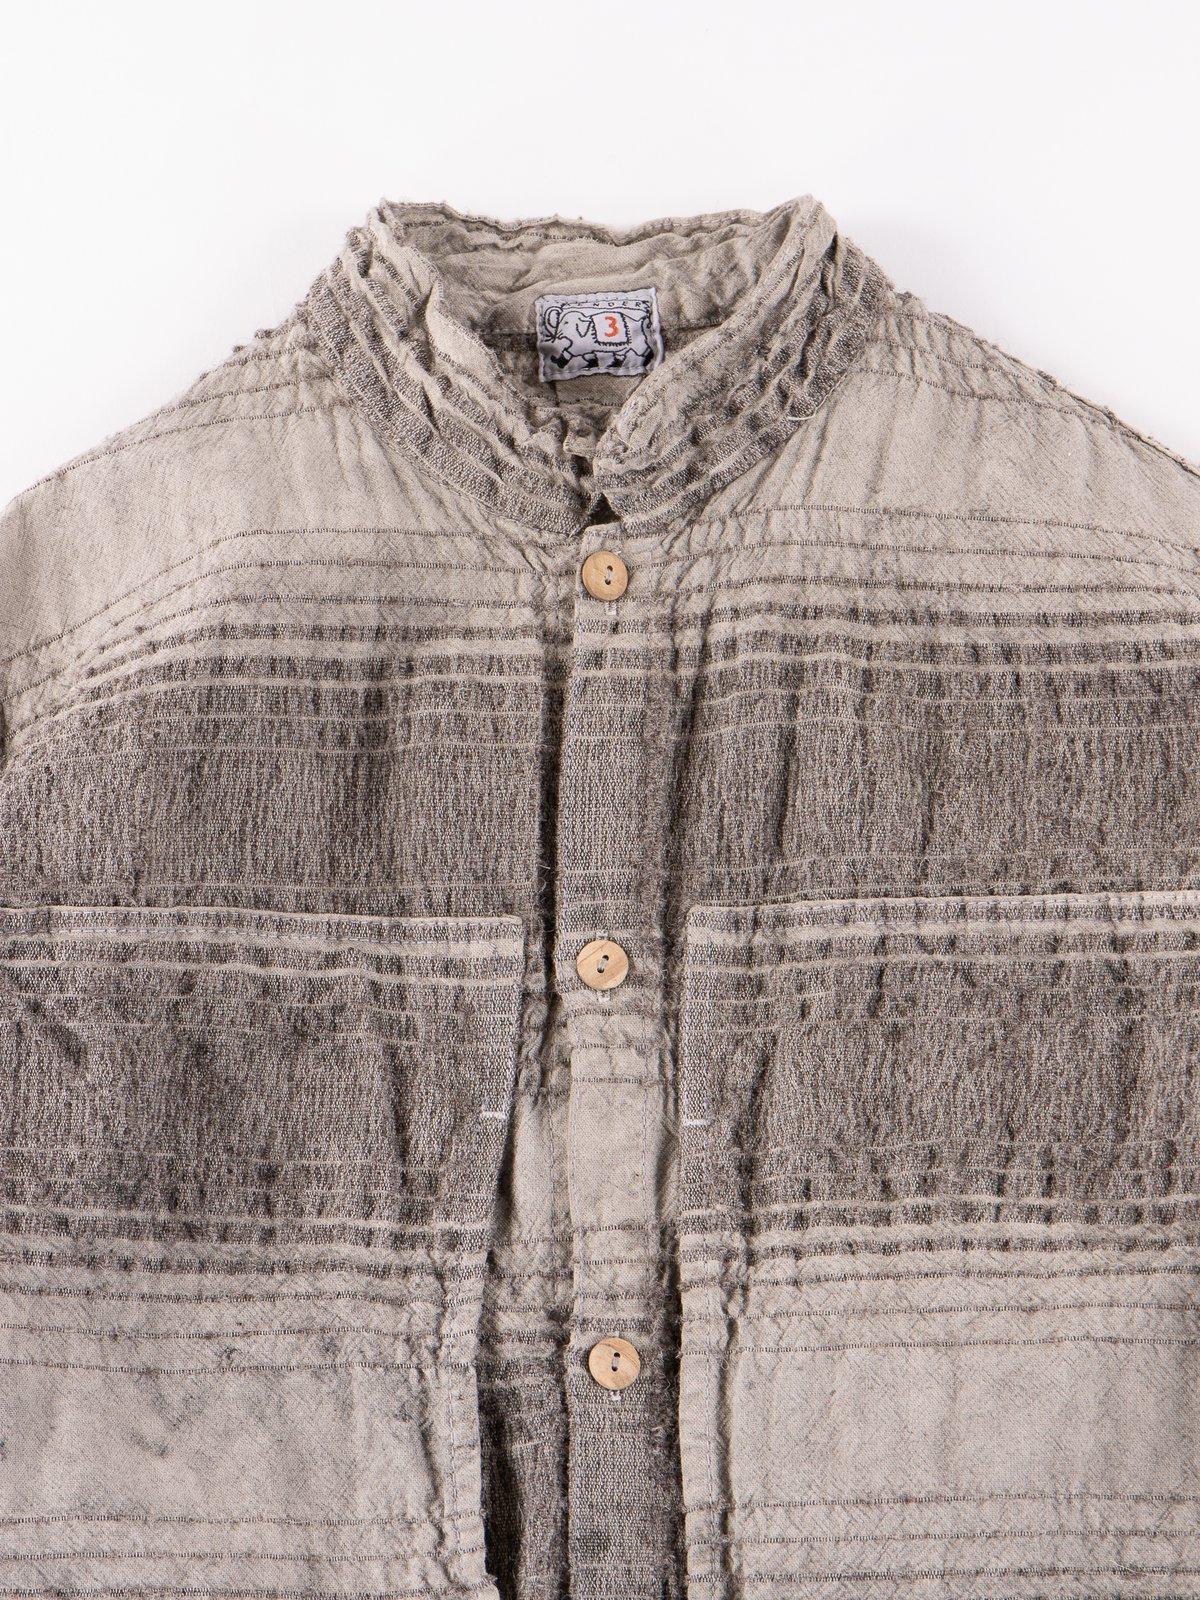 Indian Black Dye Doppler Stripe Calico Periscope Pocket Tail Shirt - Image 3